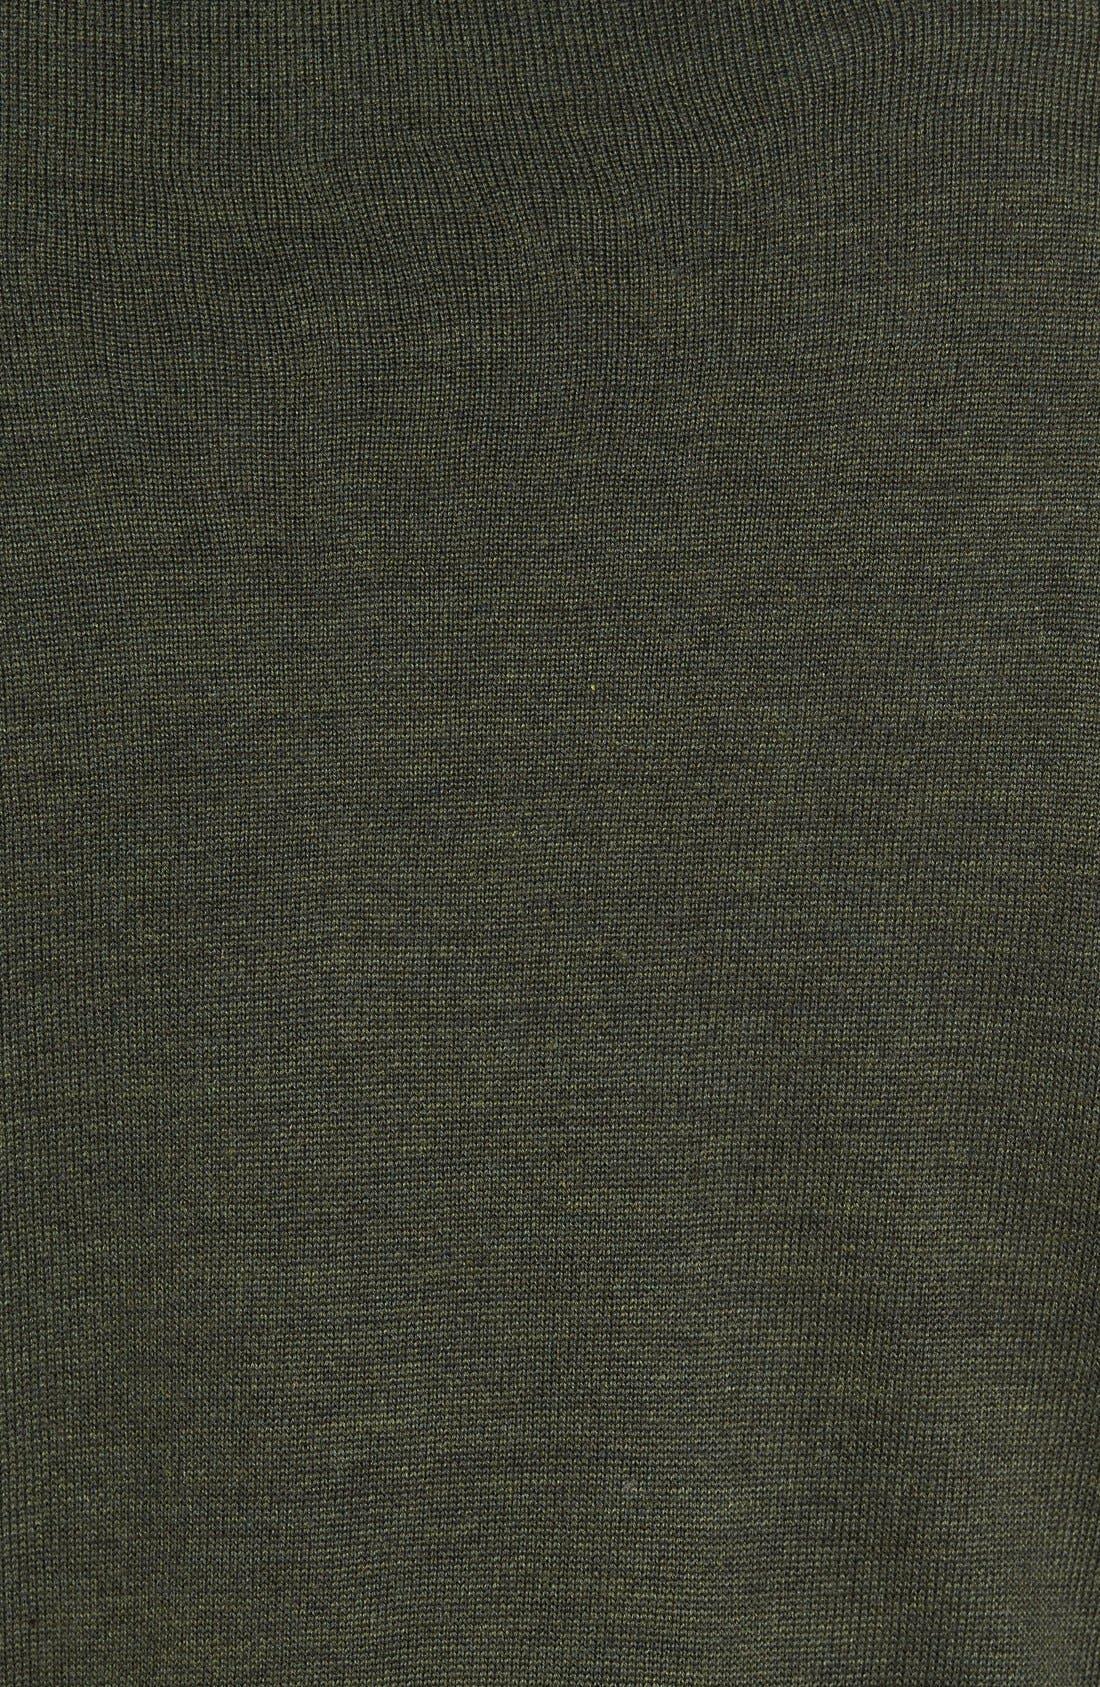 Douglas Quarter Zip Wool Blend Sweater,                             Alternate thumbnail 27, color,